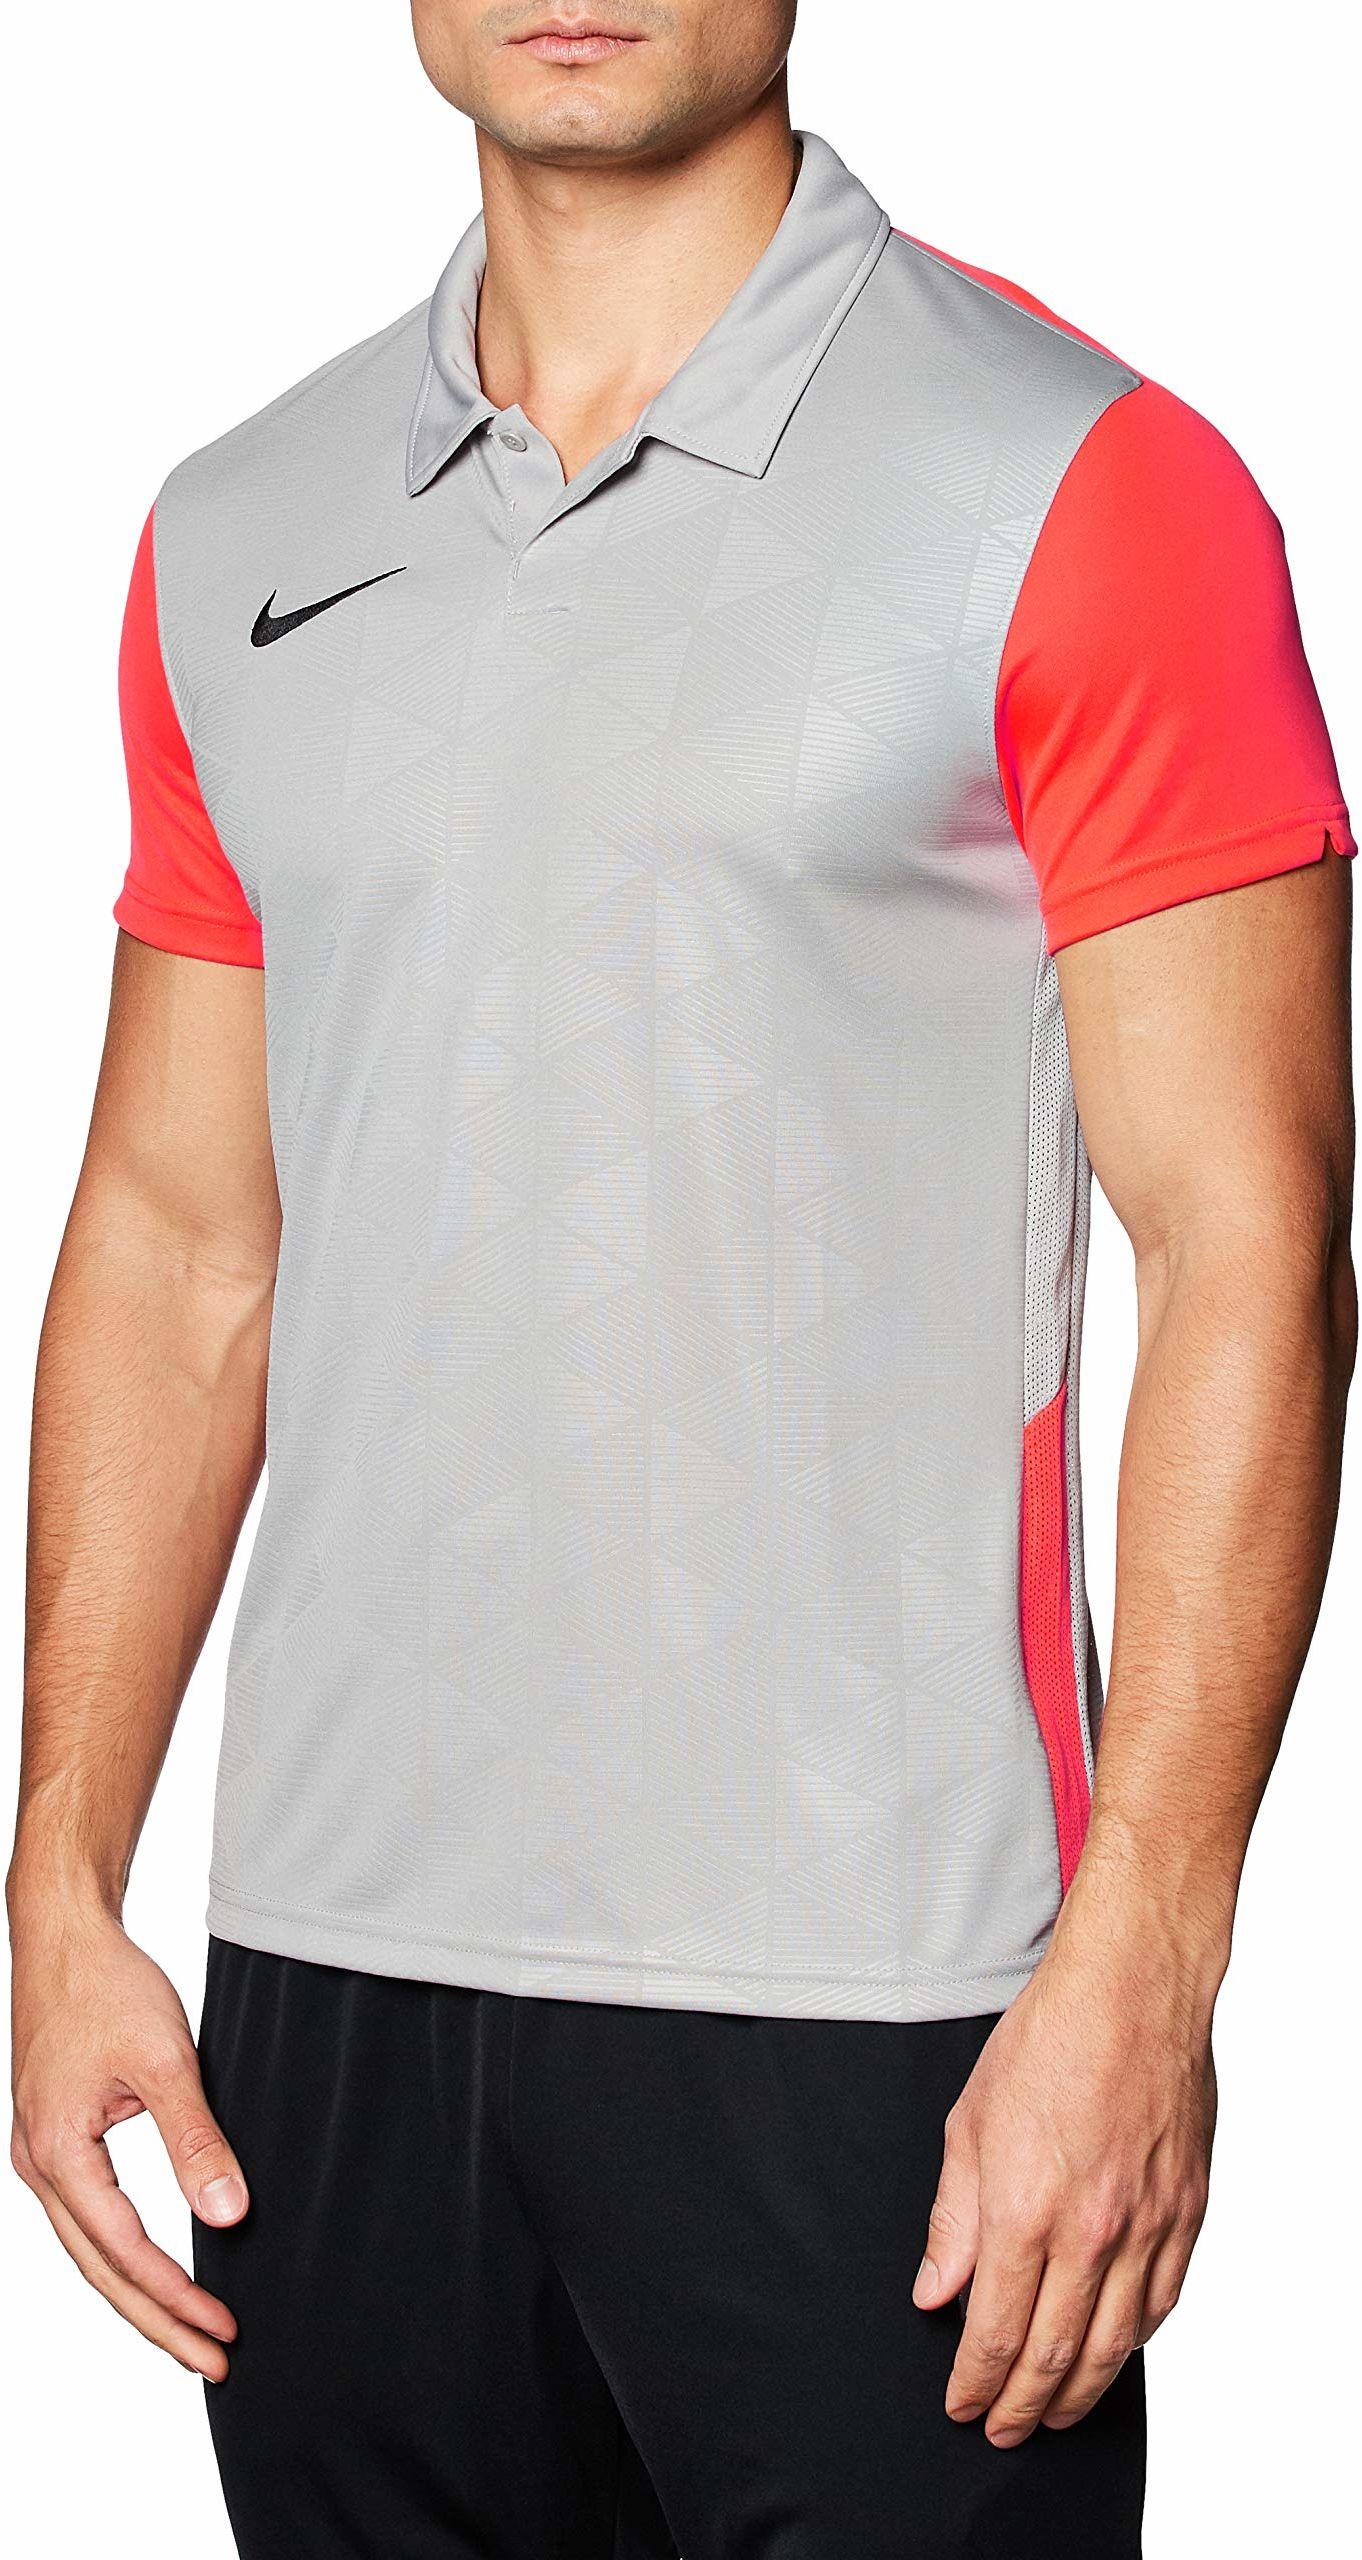 Nike Trophy IV męska koszulka polo, Pewter Grey/Bright Crimson/Black, 2XL